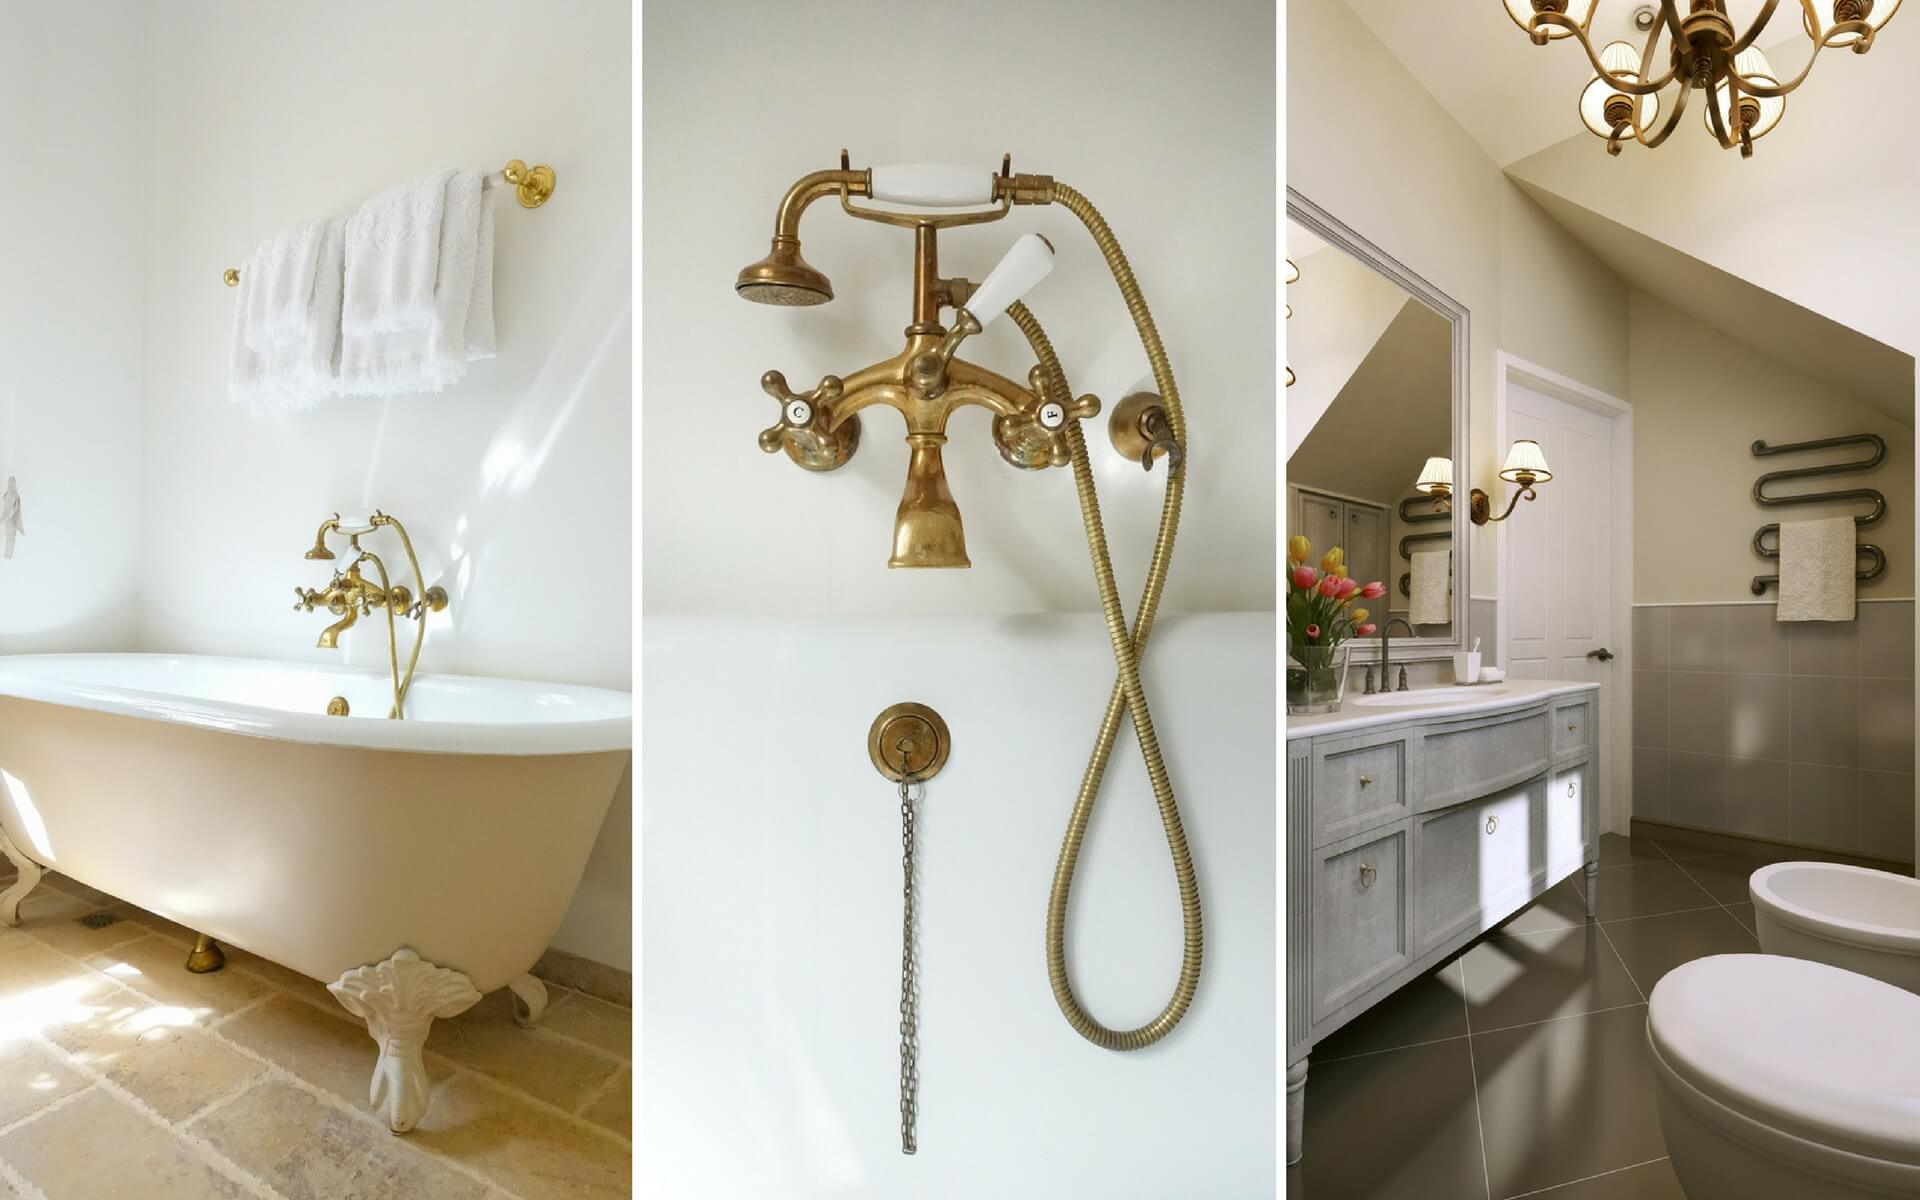 Vasca Da Bagno Stile Francese : Come arredare la casa in stile provenzale. blog oknoplast